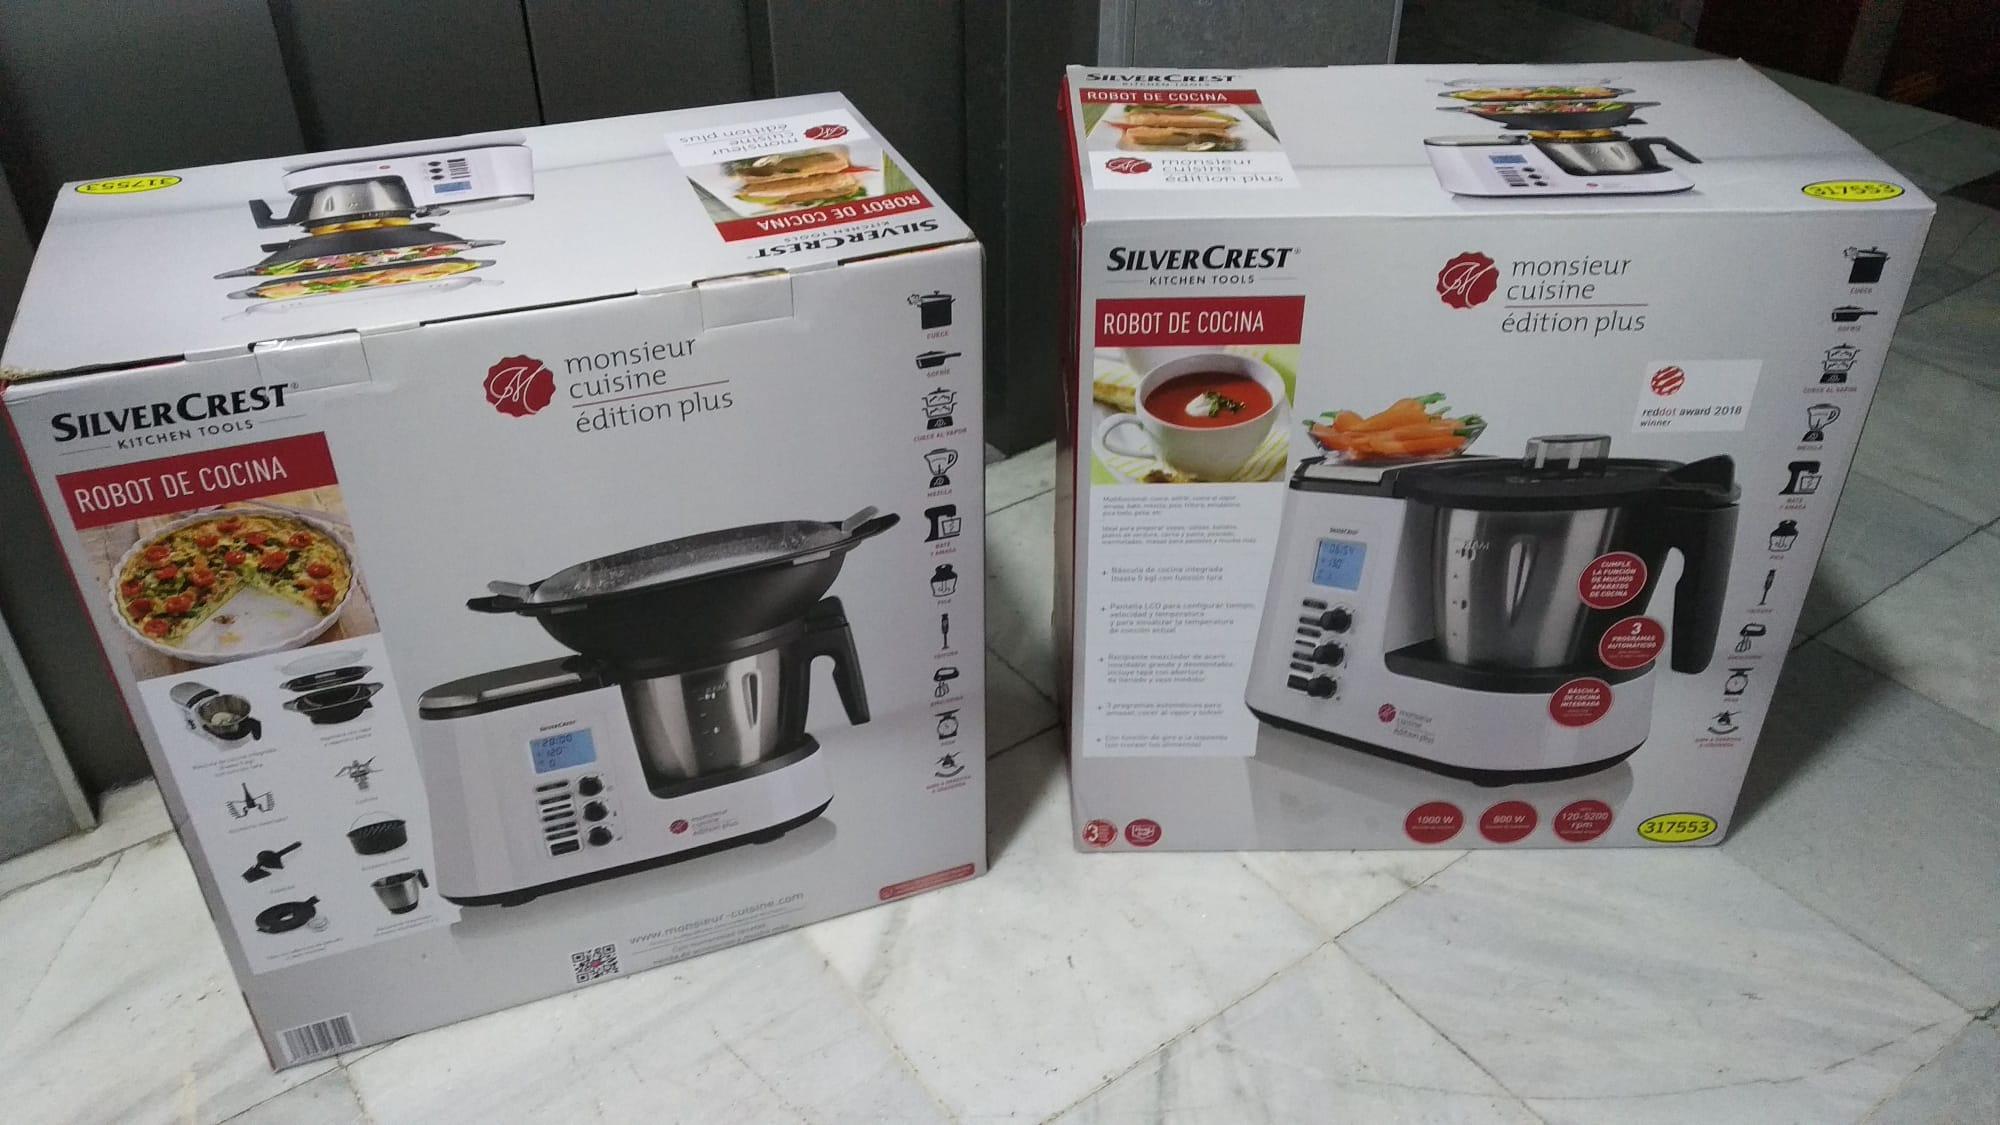 Monsieur Cuisine Plus - El famoso robot cocina Lidl (Visto en nueva tienda Lidl Elche)